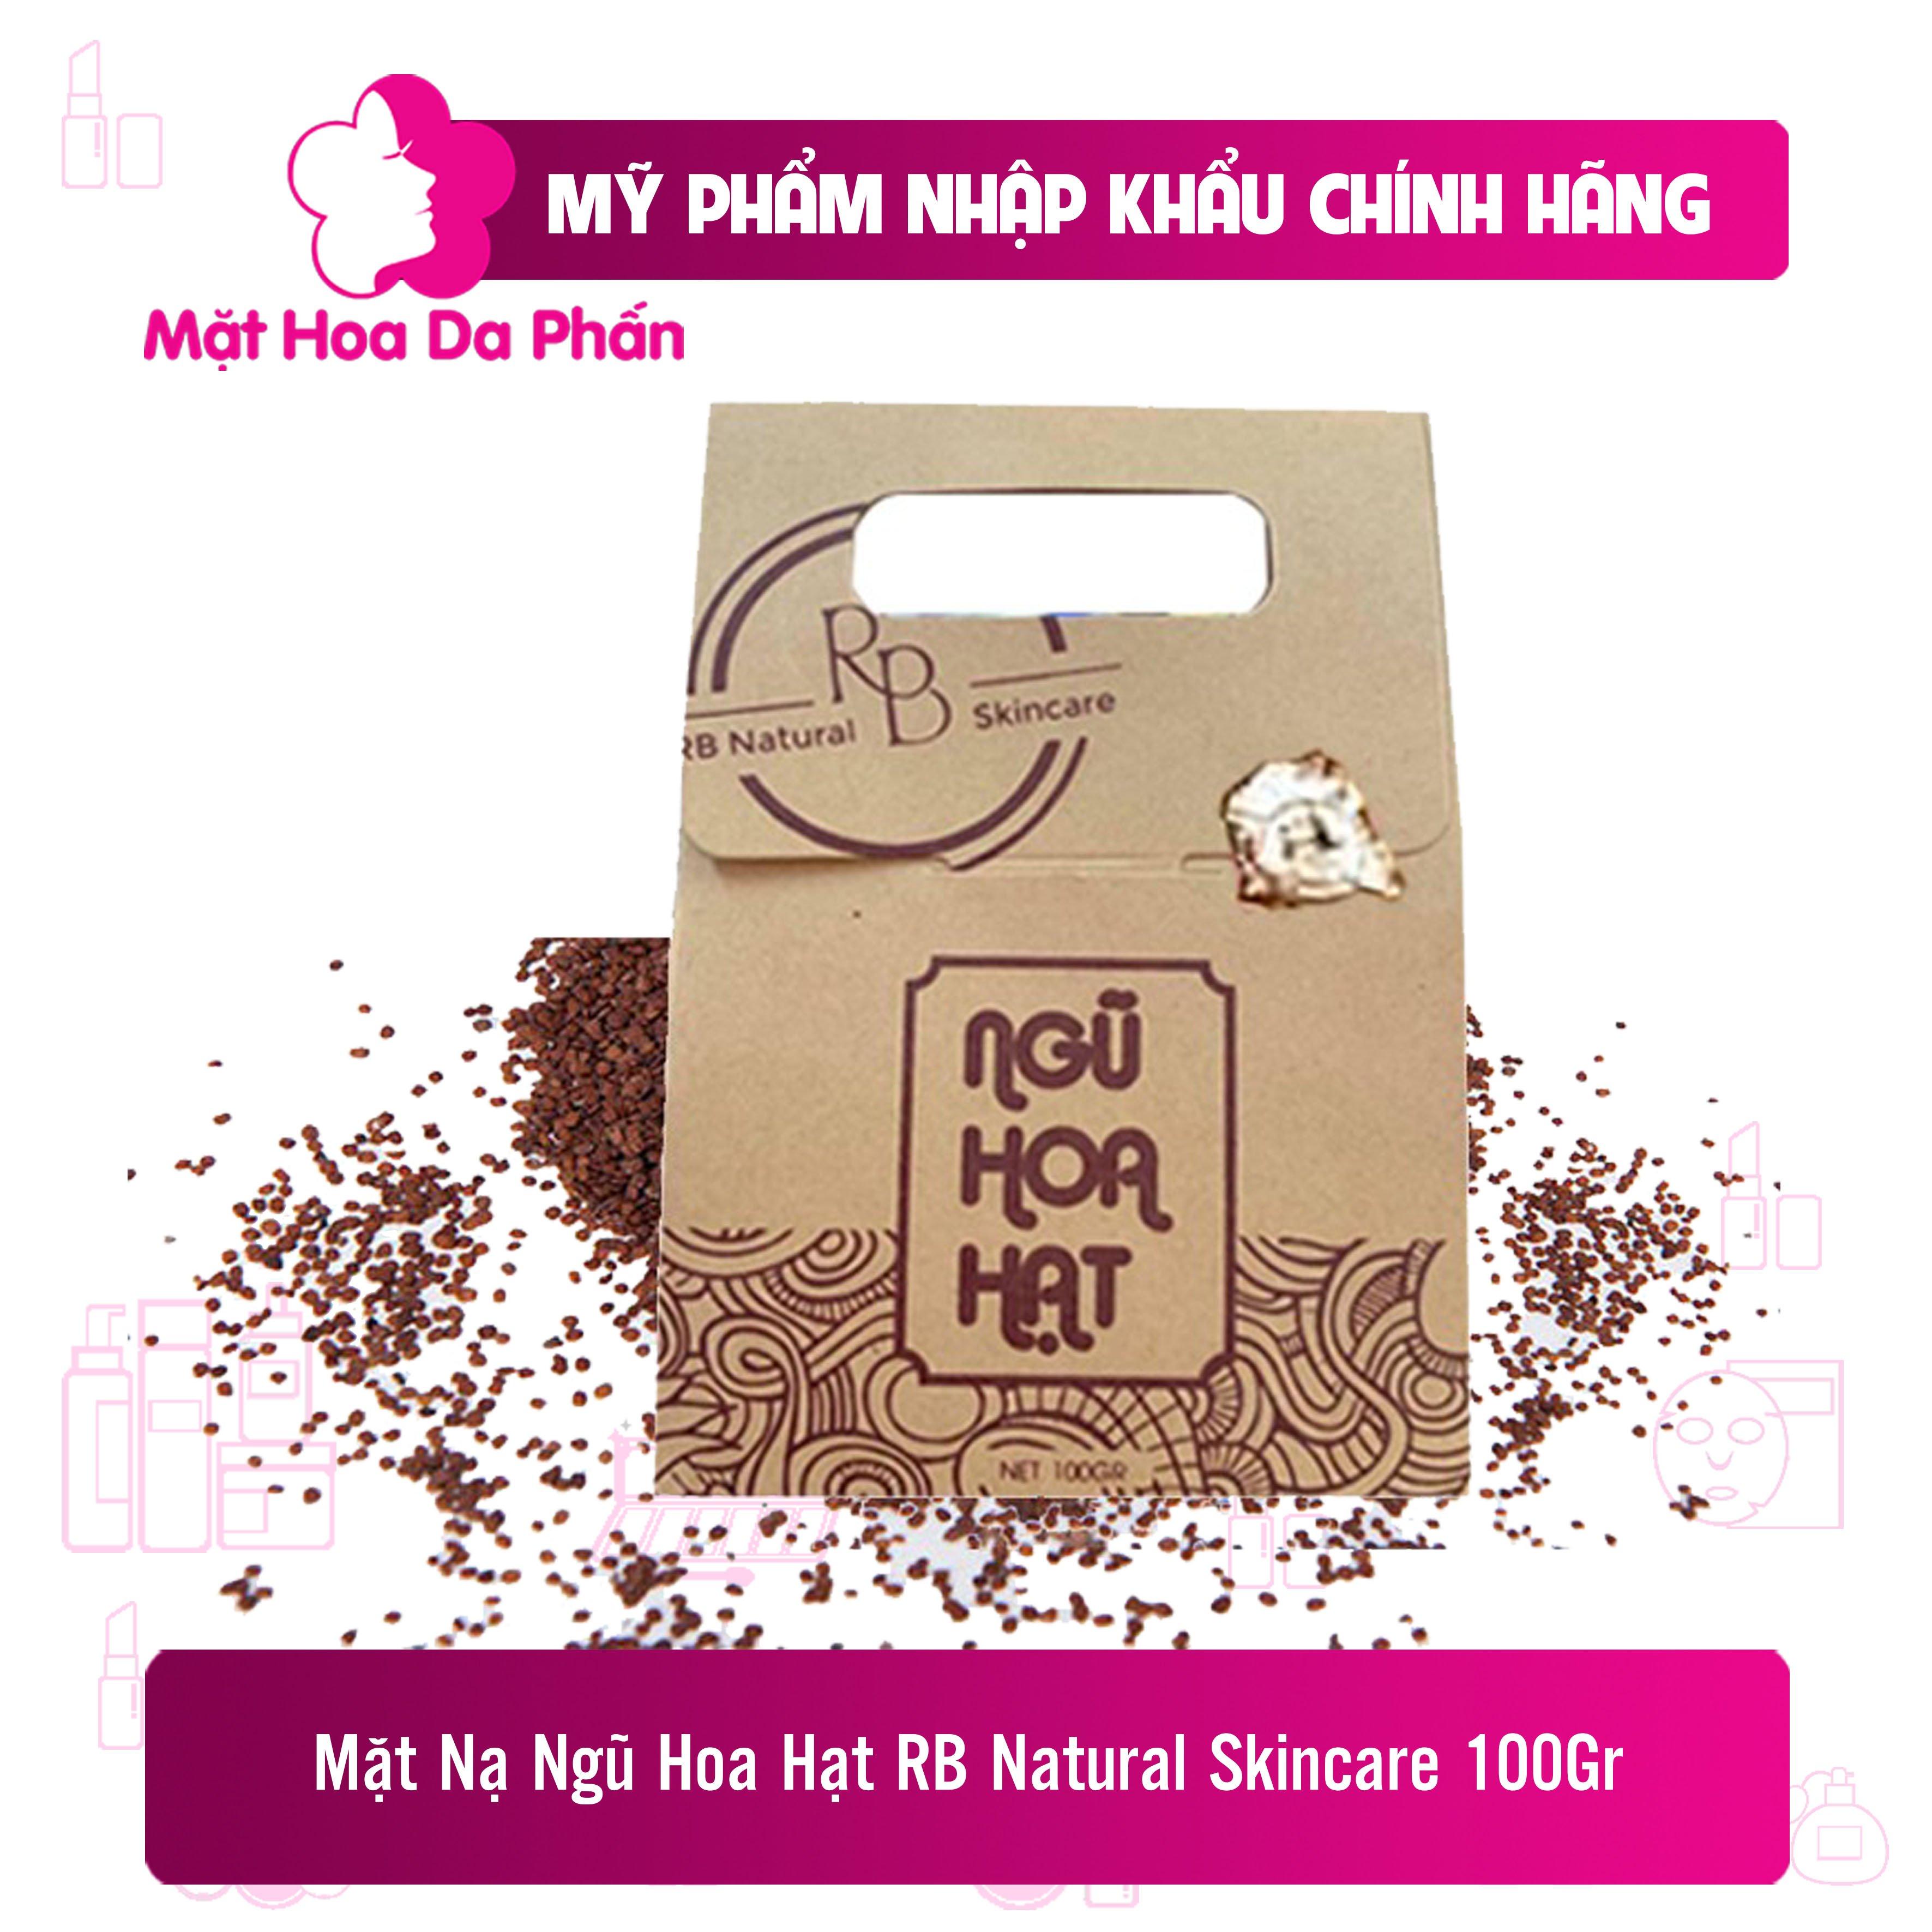 Mặt Nạ Ngũ Hoa Hạt RB Natural Skincare 100g